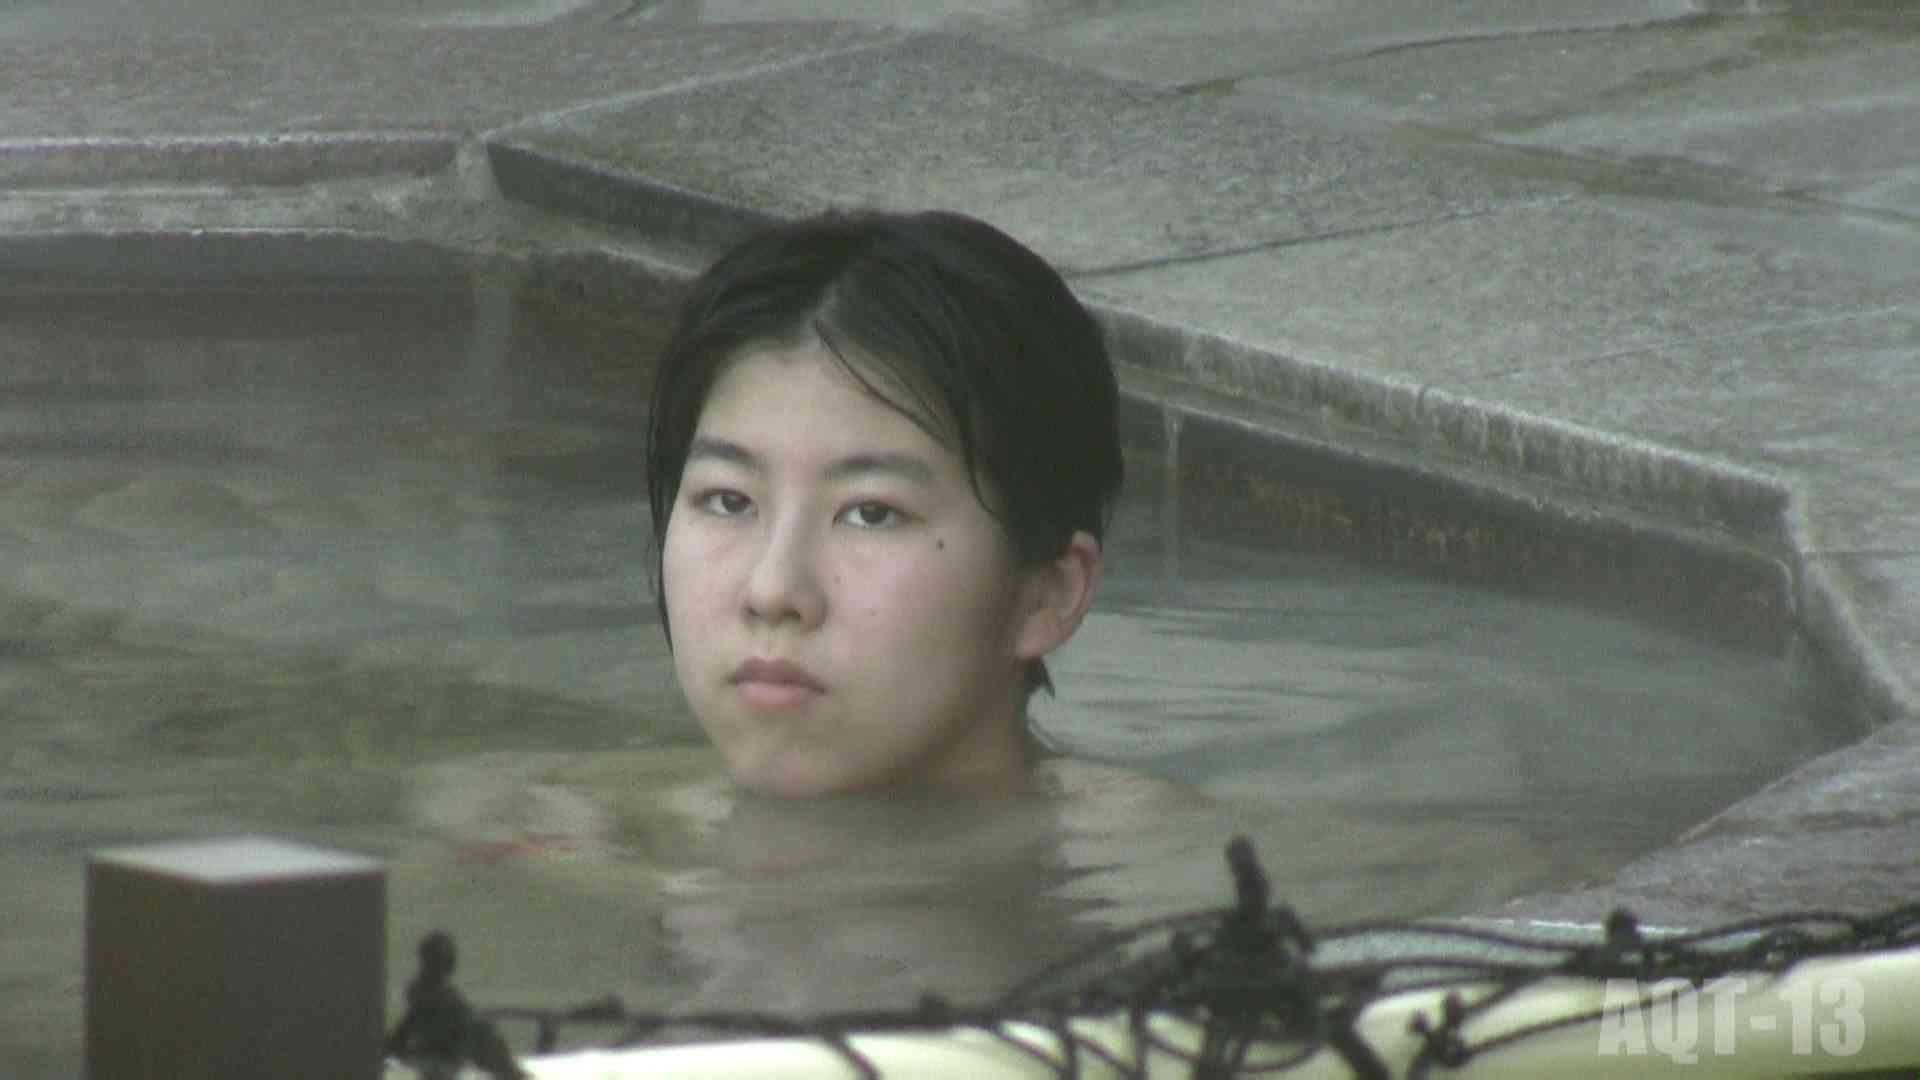 Aquaな露天風呂Vol.816 露天  53連発 1